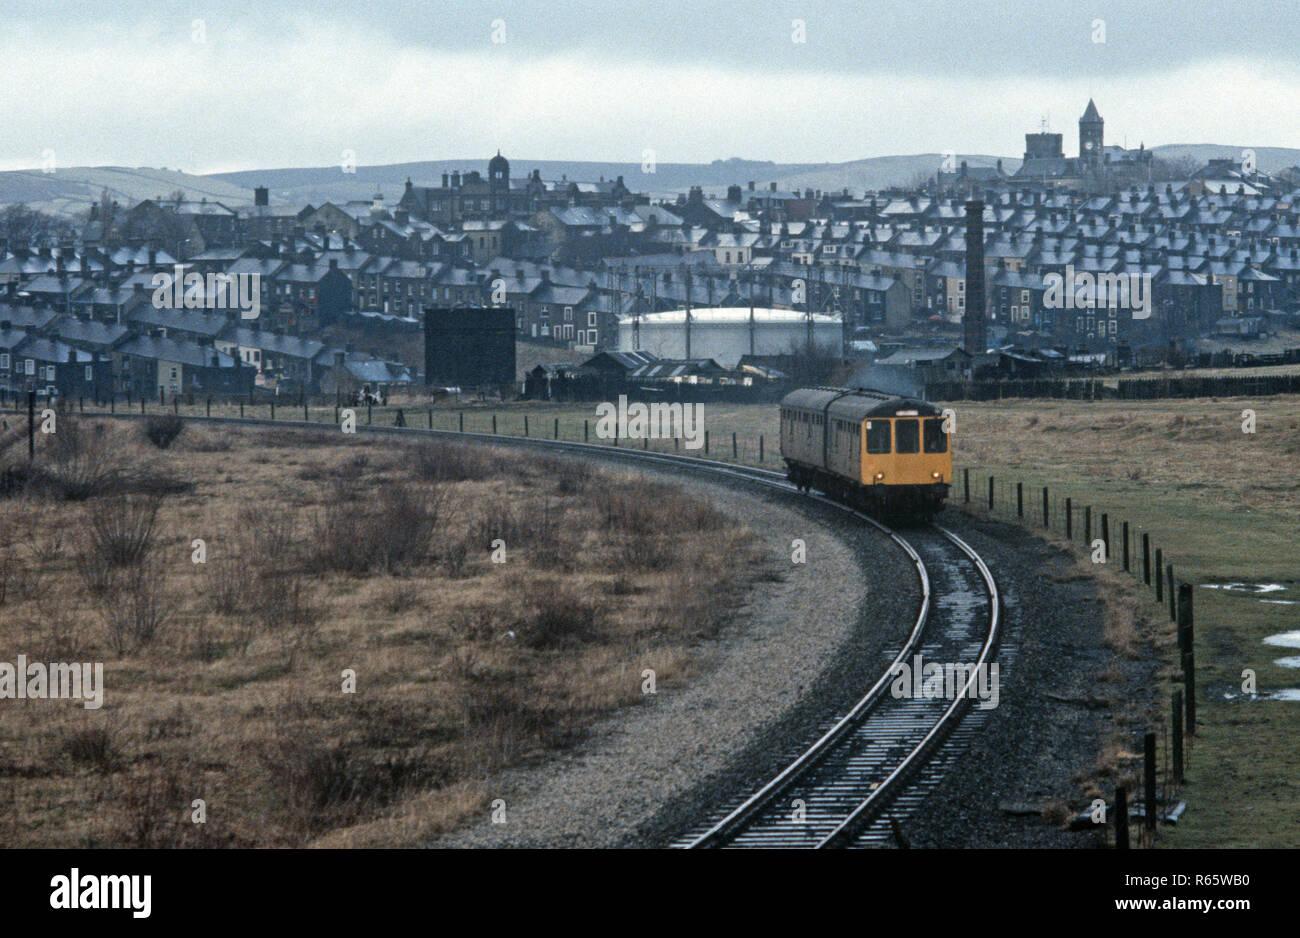 Diesel Multiple Unit on the British Rail Preston to Colne railway line at Colne, Lancashire, Great Britain - Stock Image